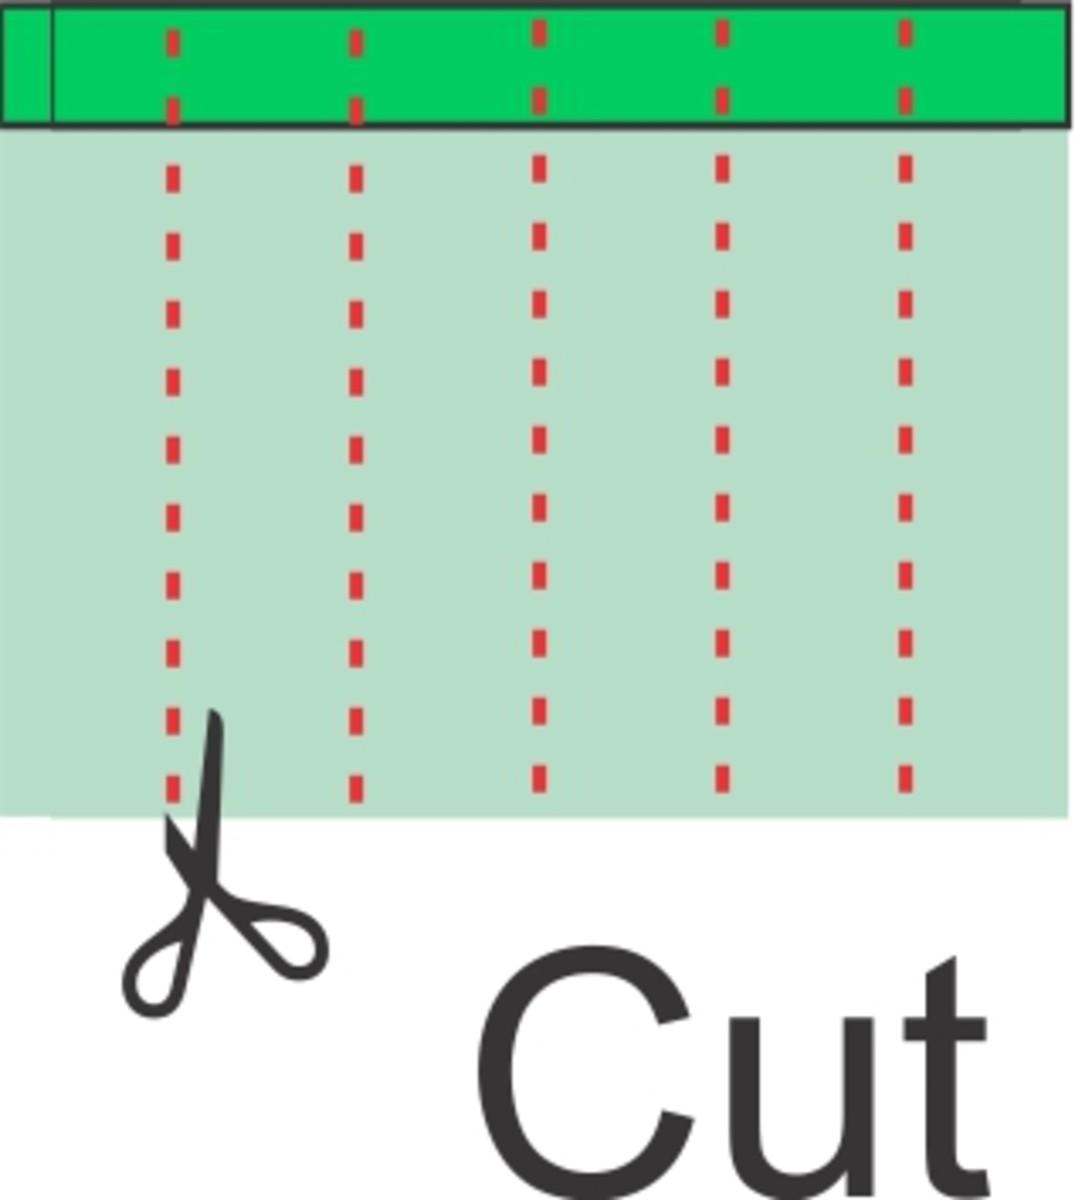 Cross-grain binding